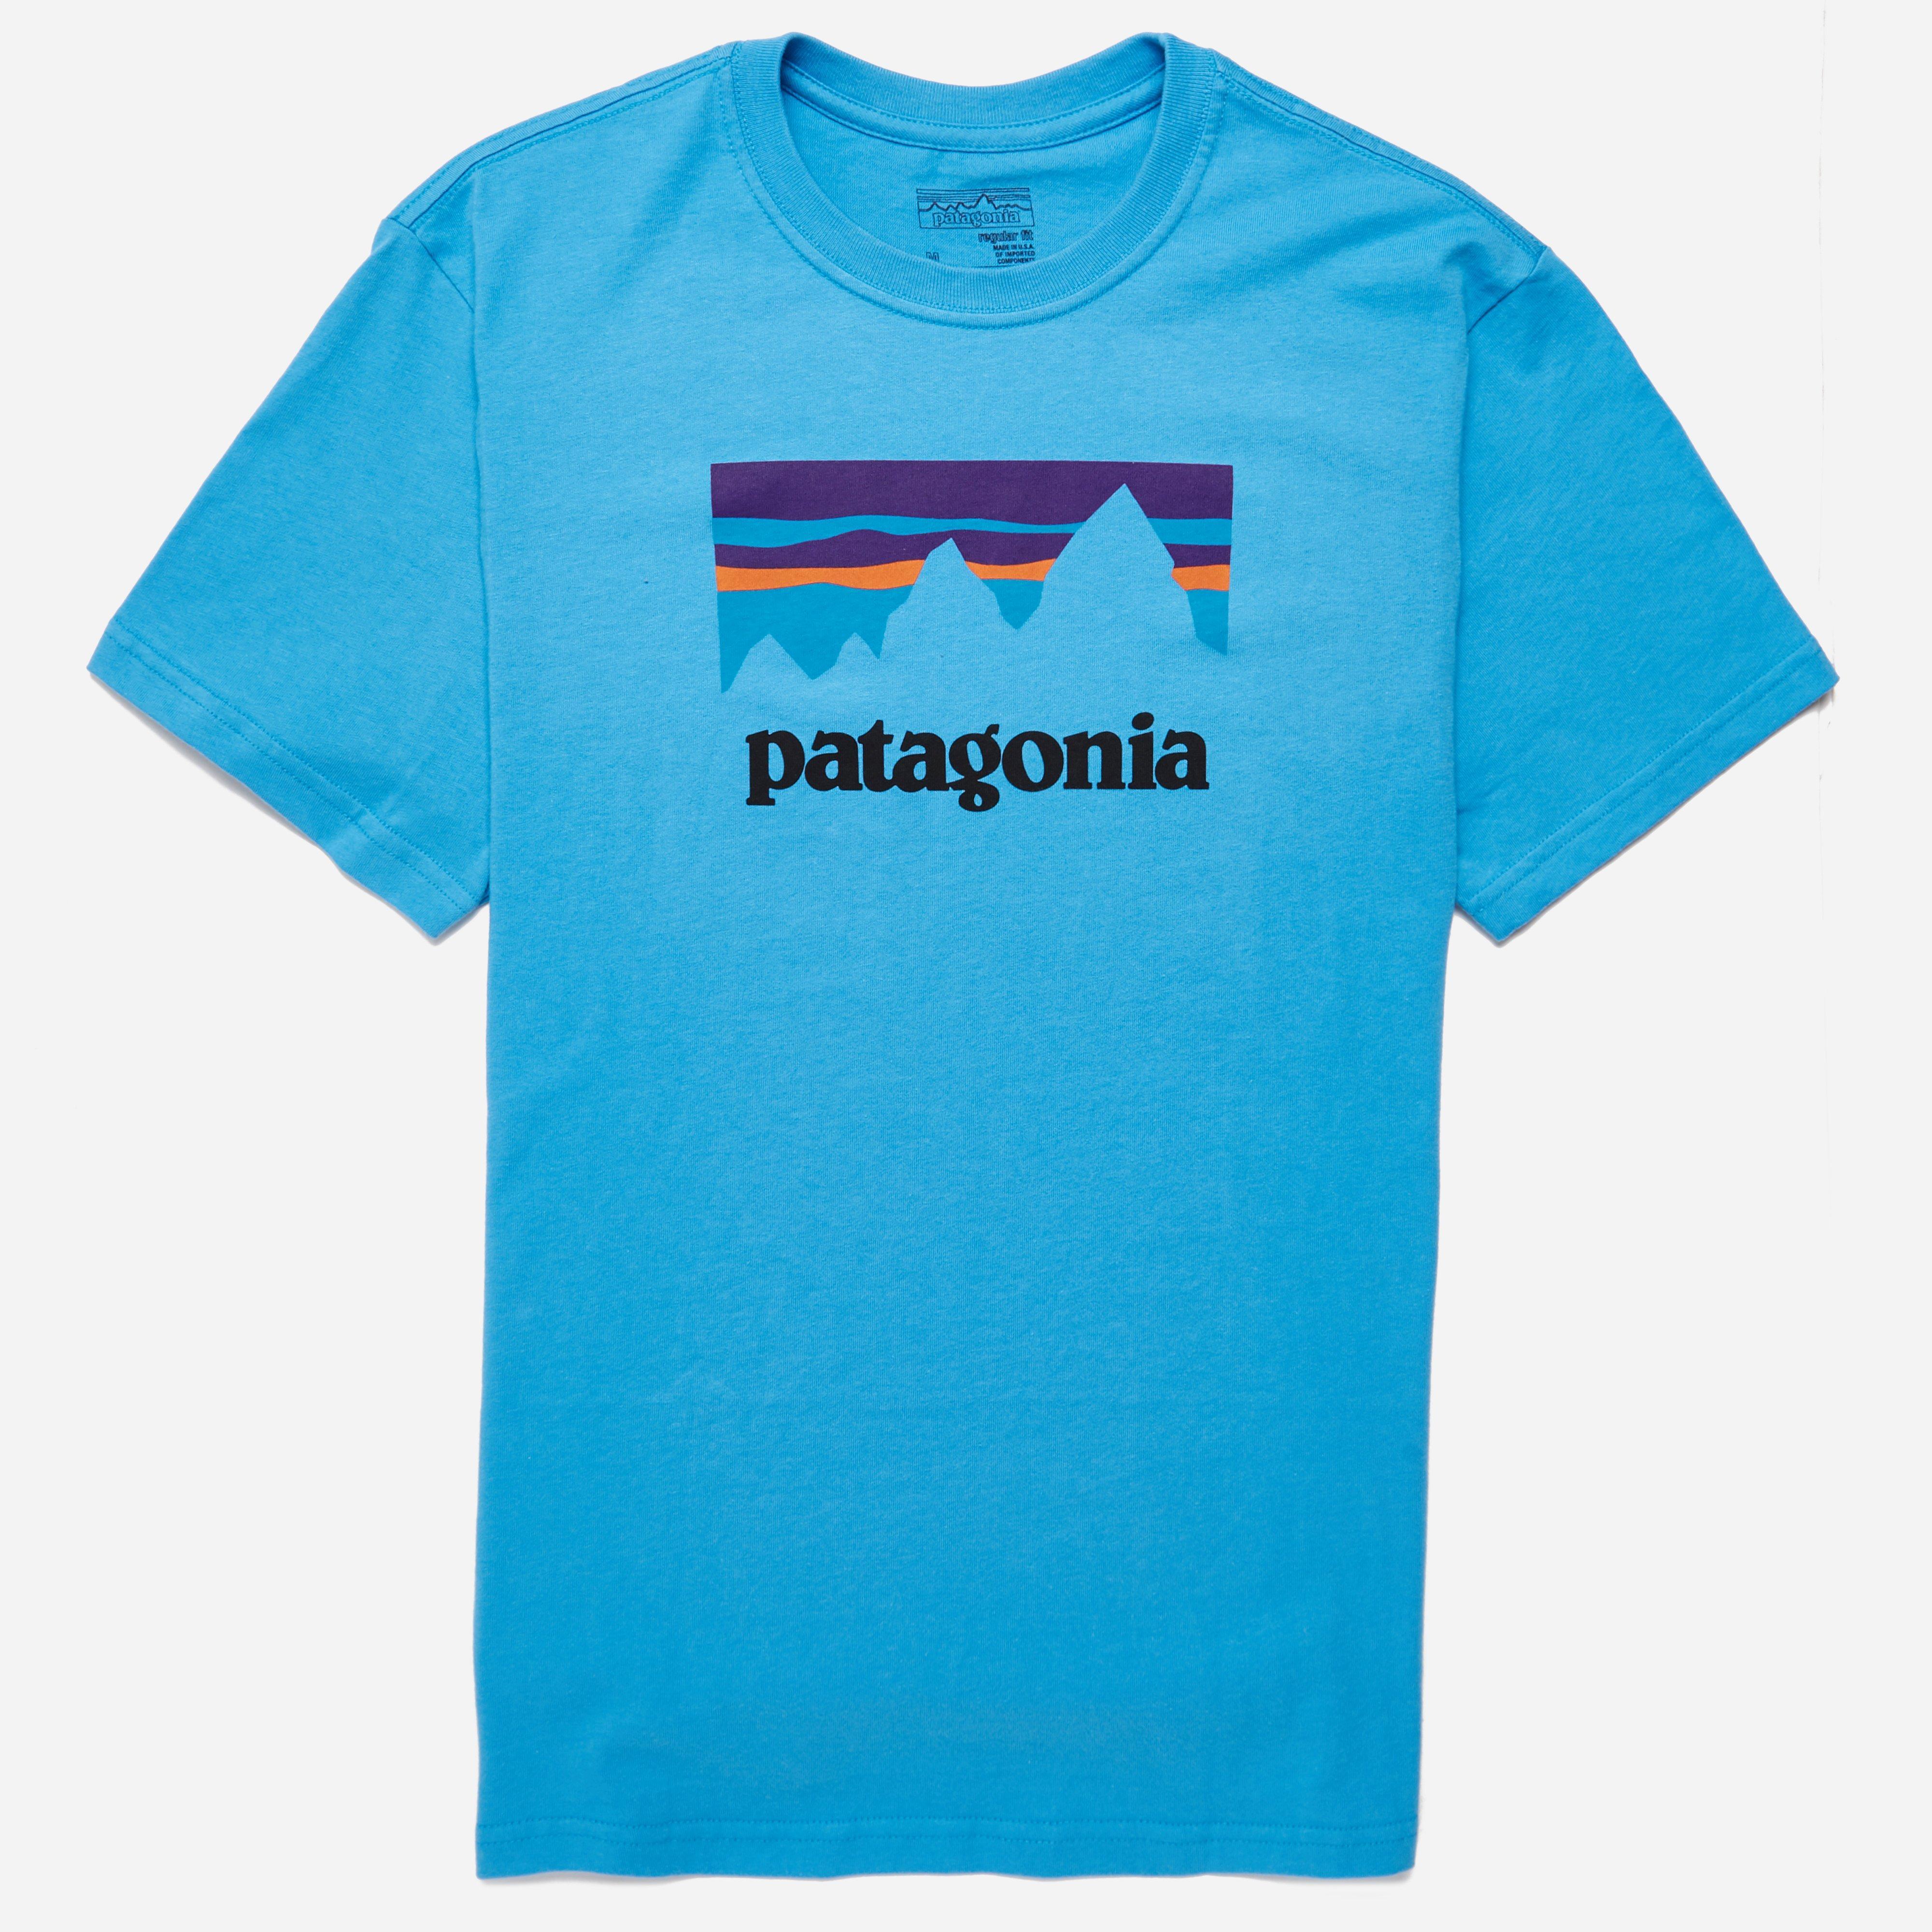 Patagonia Shop Sticker Cotton T-shirt